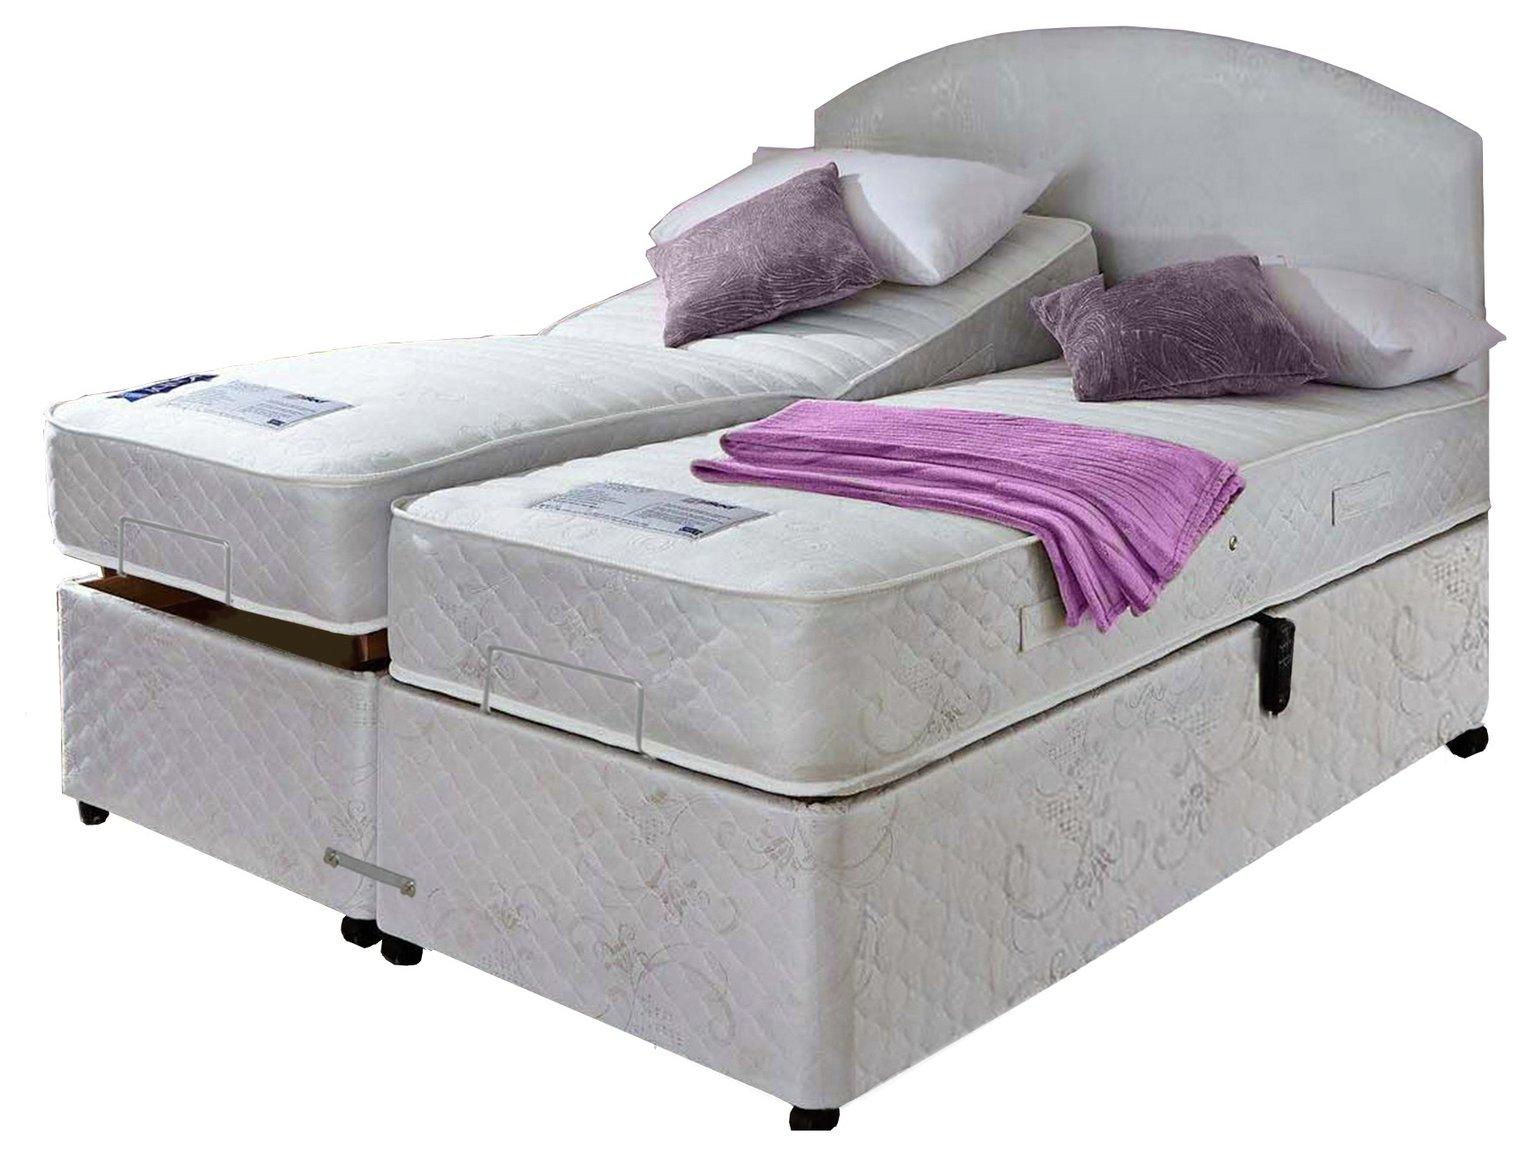 MiBed Adjustable 5 Barrow King Bed